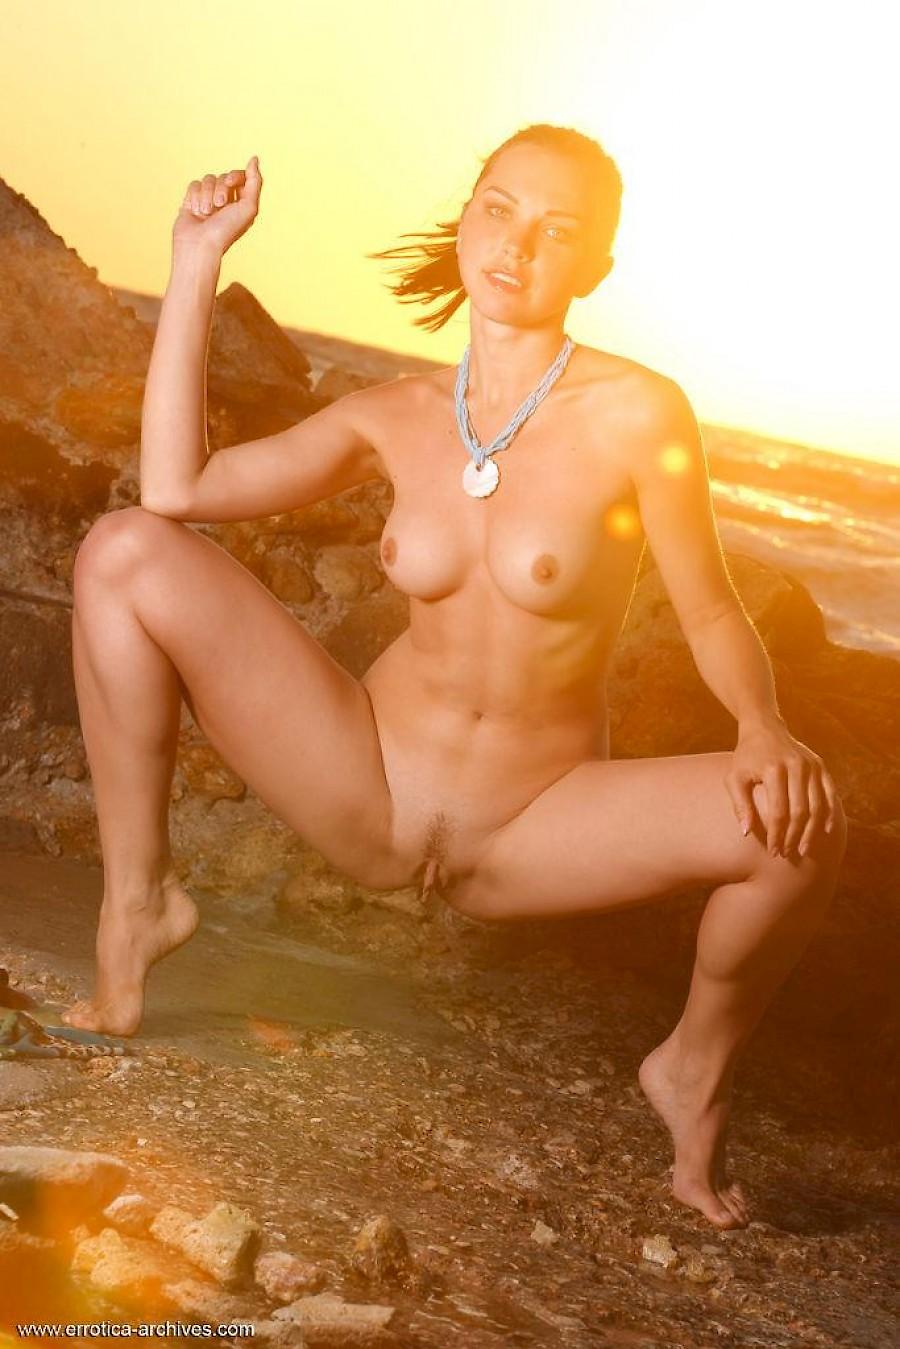 Amanecer Porn Family sexy babe anita e shows off her gorgeous body on the beach